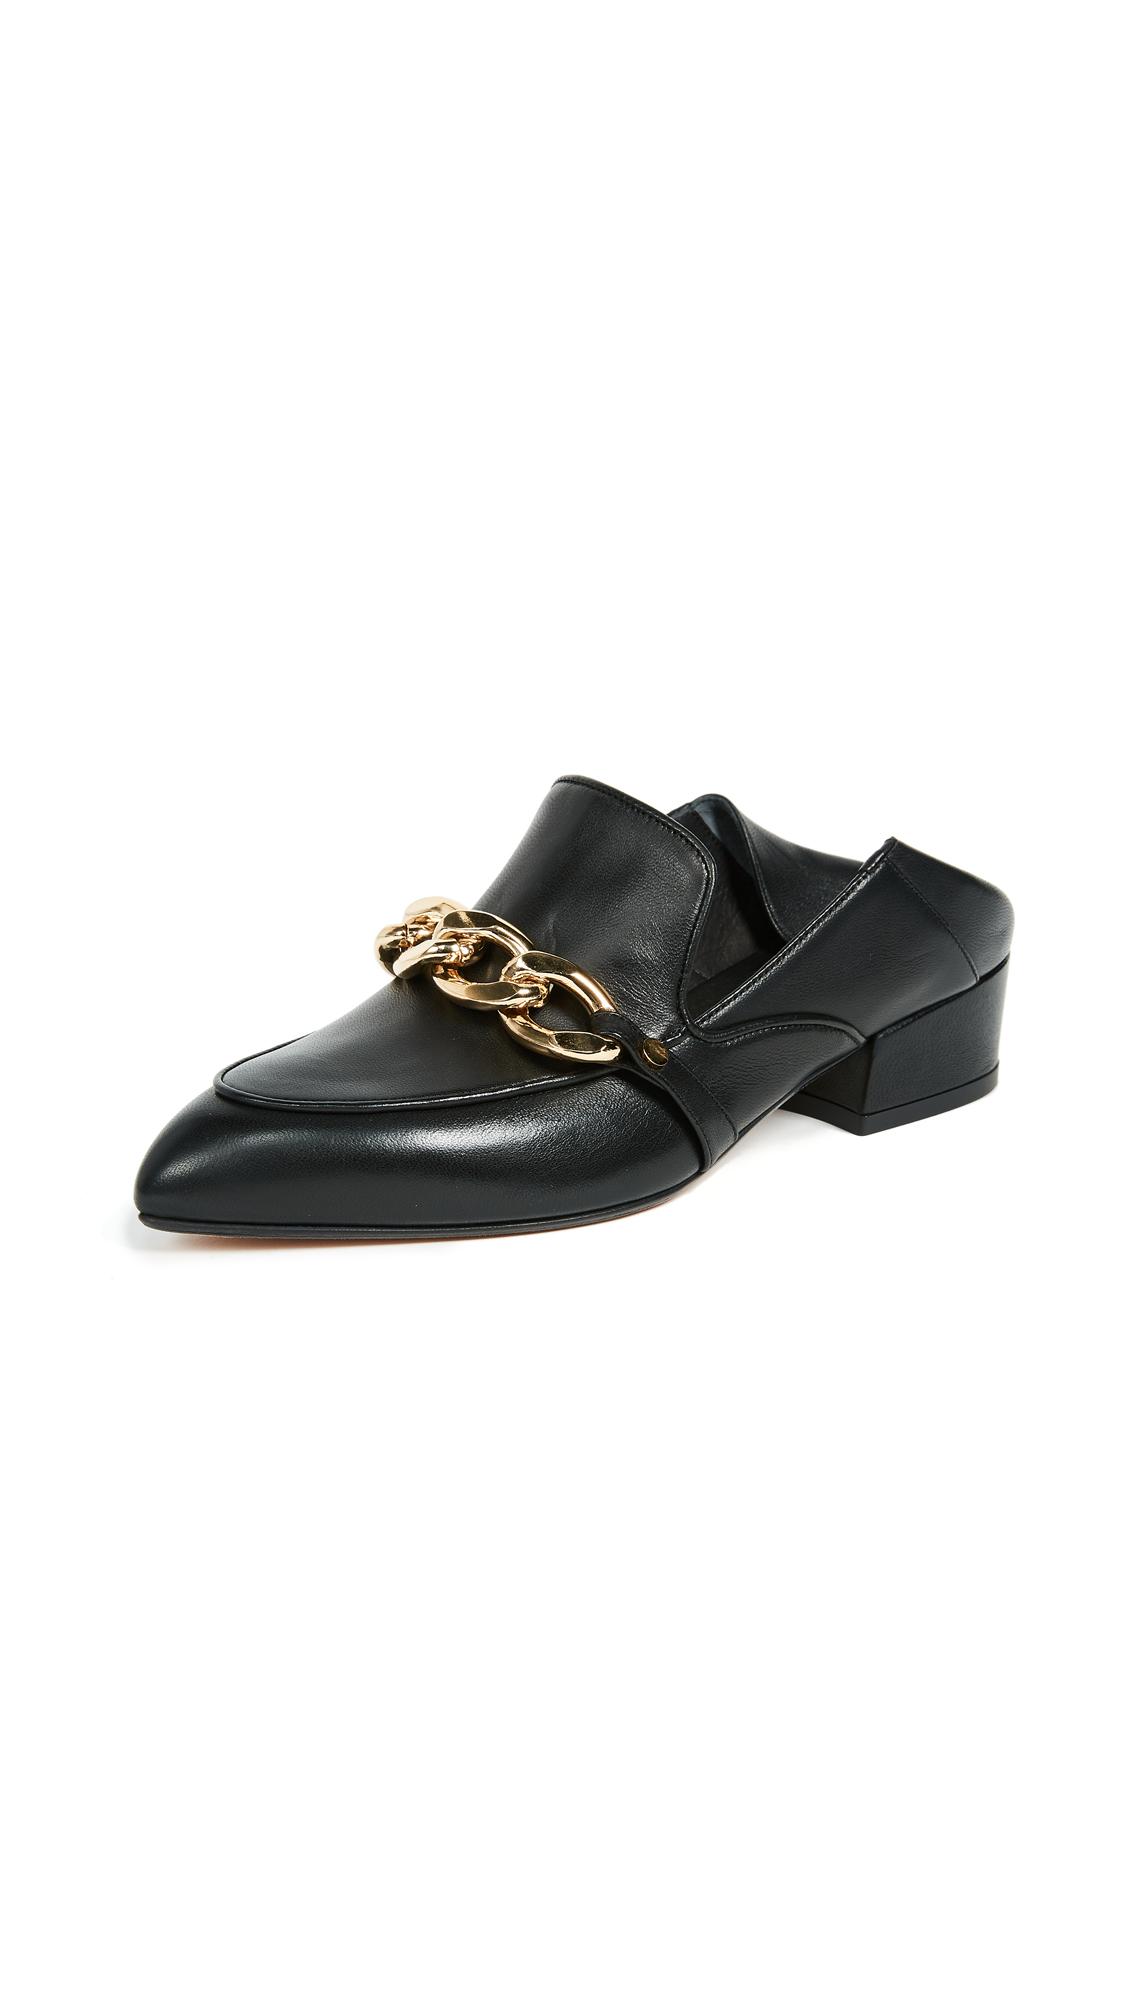 Veronica Beard Jaxon Loafers - Black